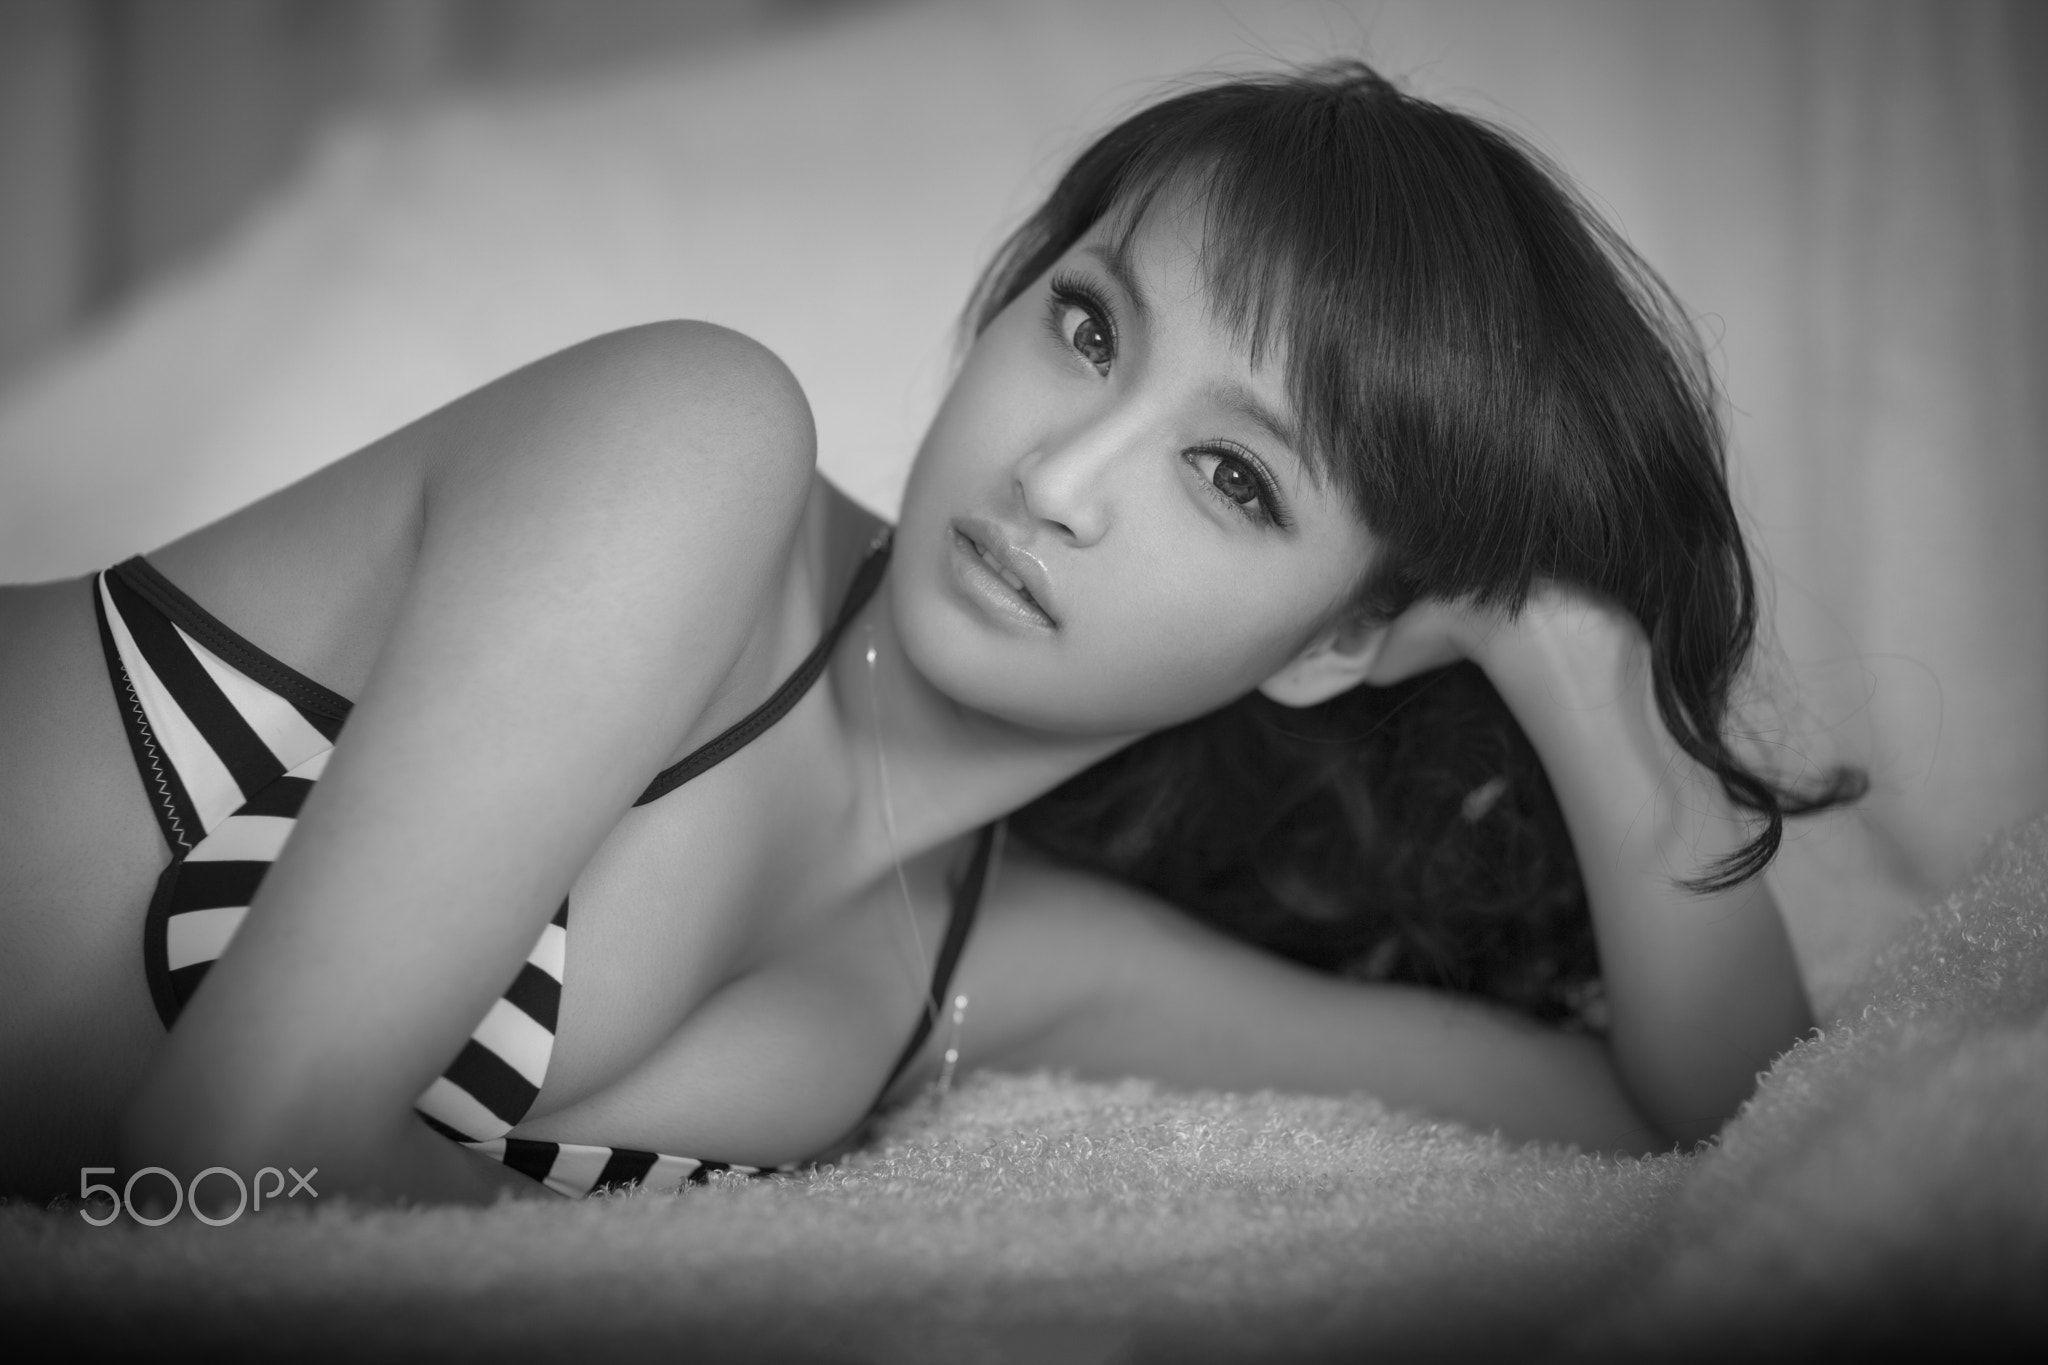 Actress julie white nude photos — 1